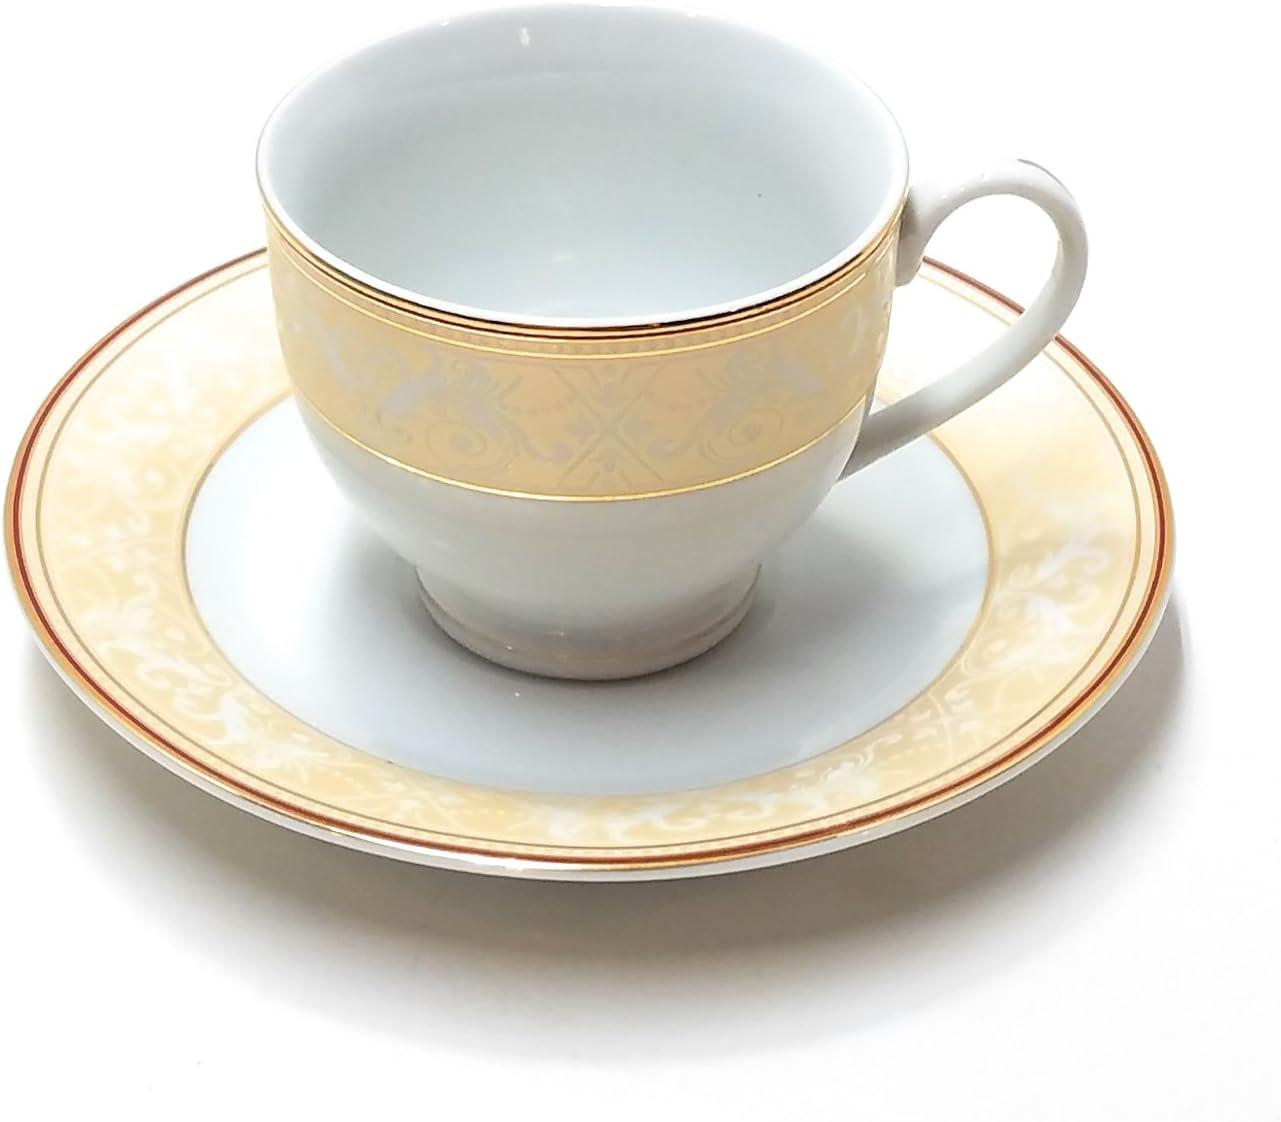 Amazon.com: Elegancy Fine China Tea or Coffee Cups and Saucers Set